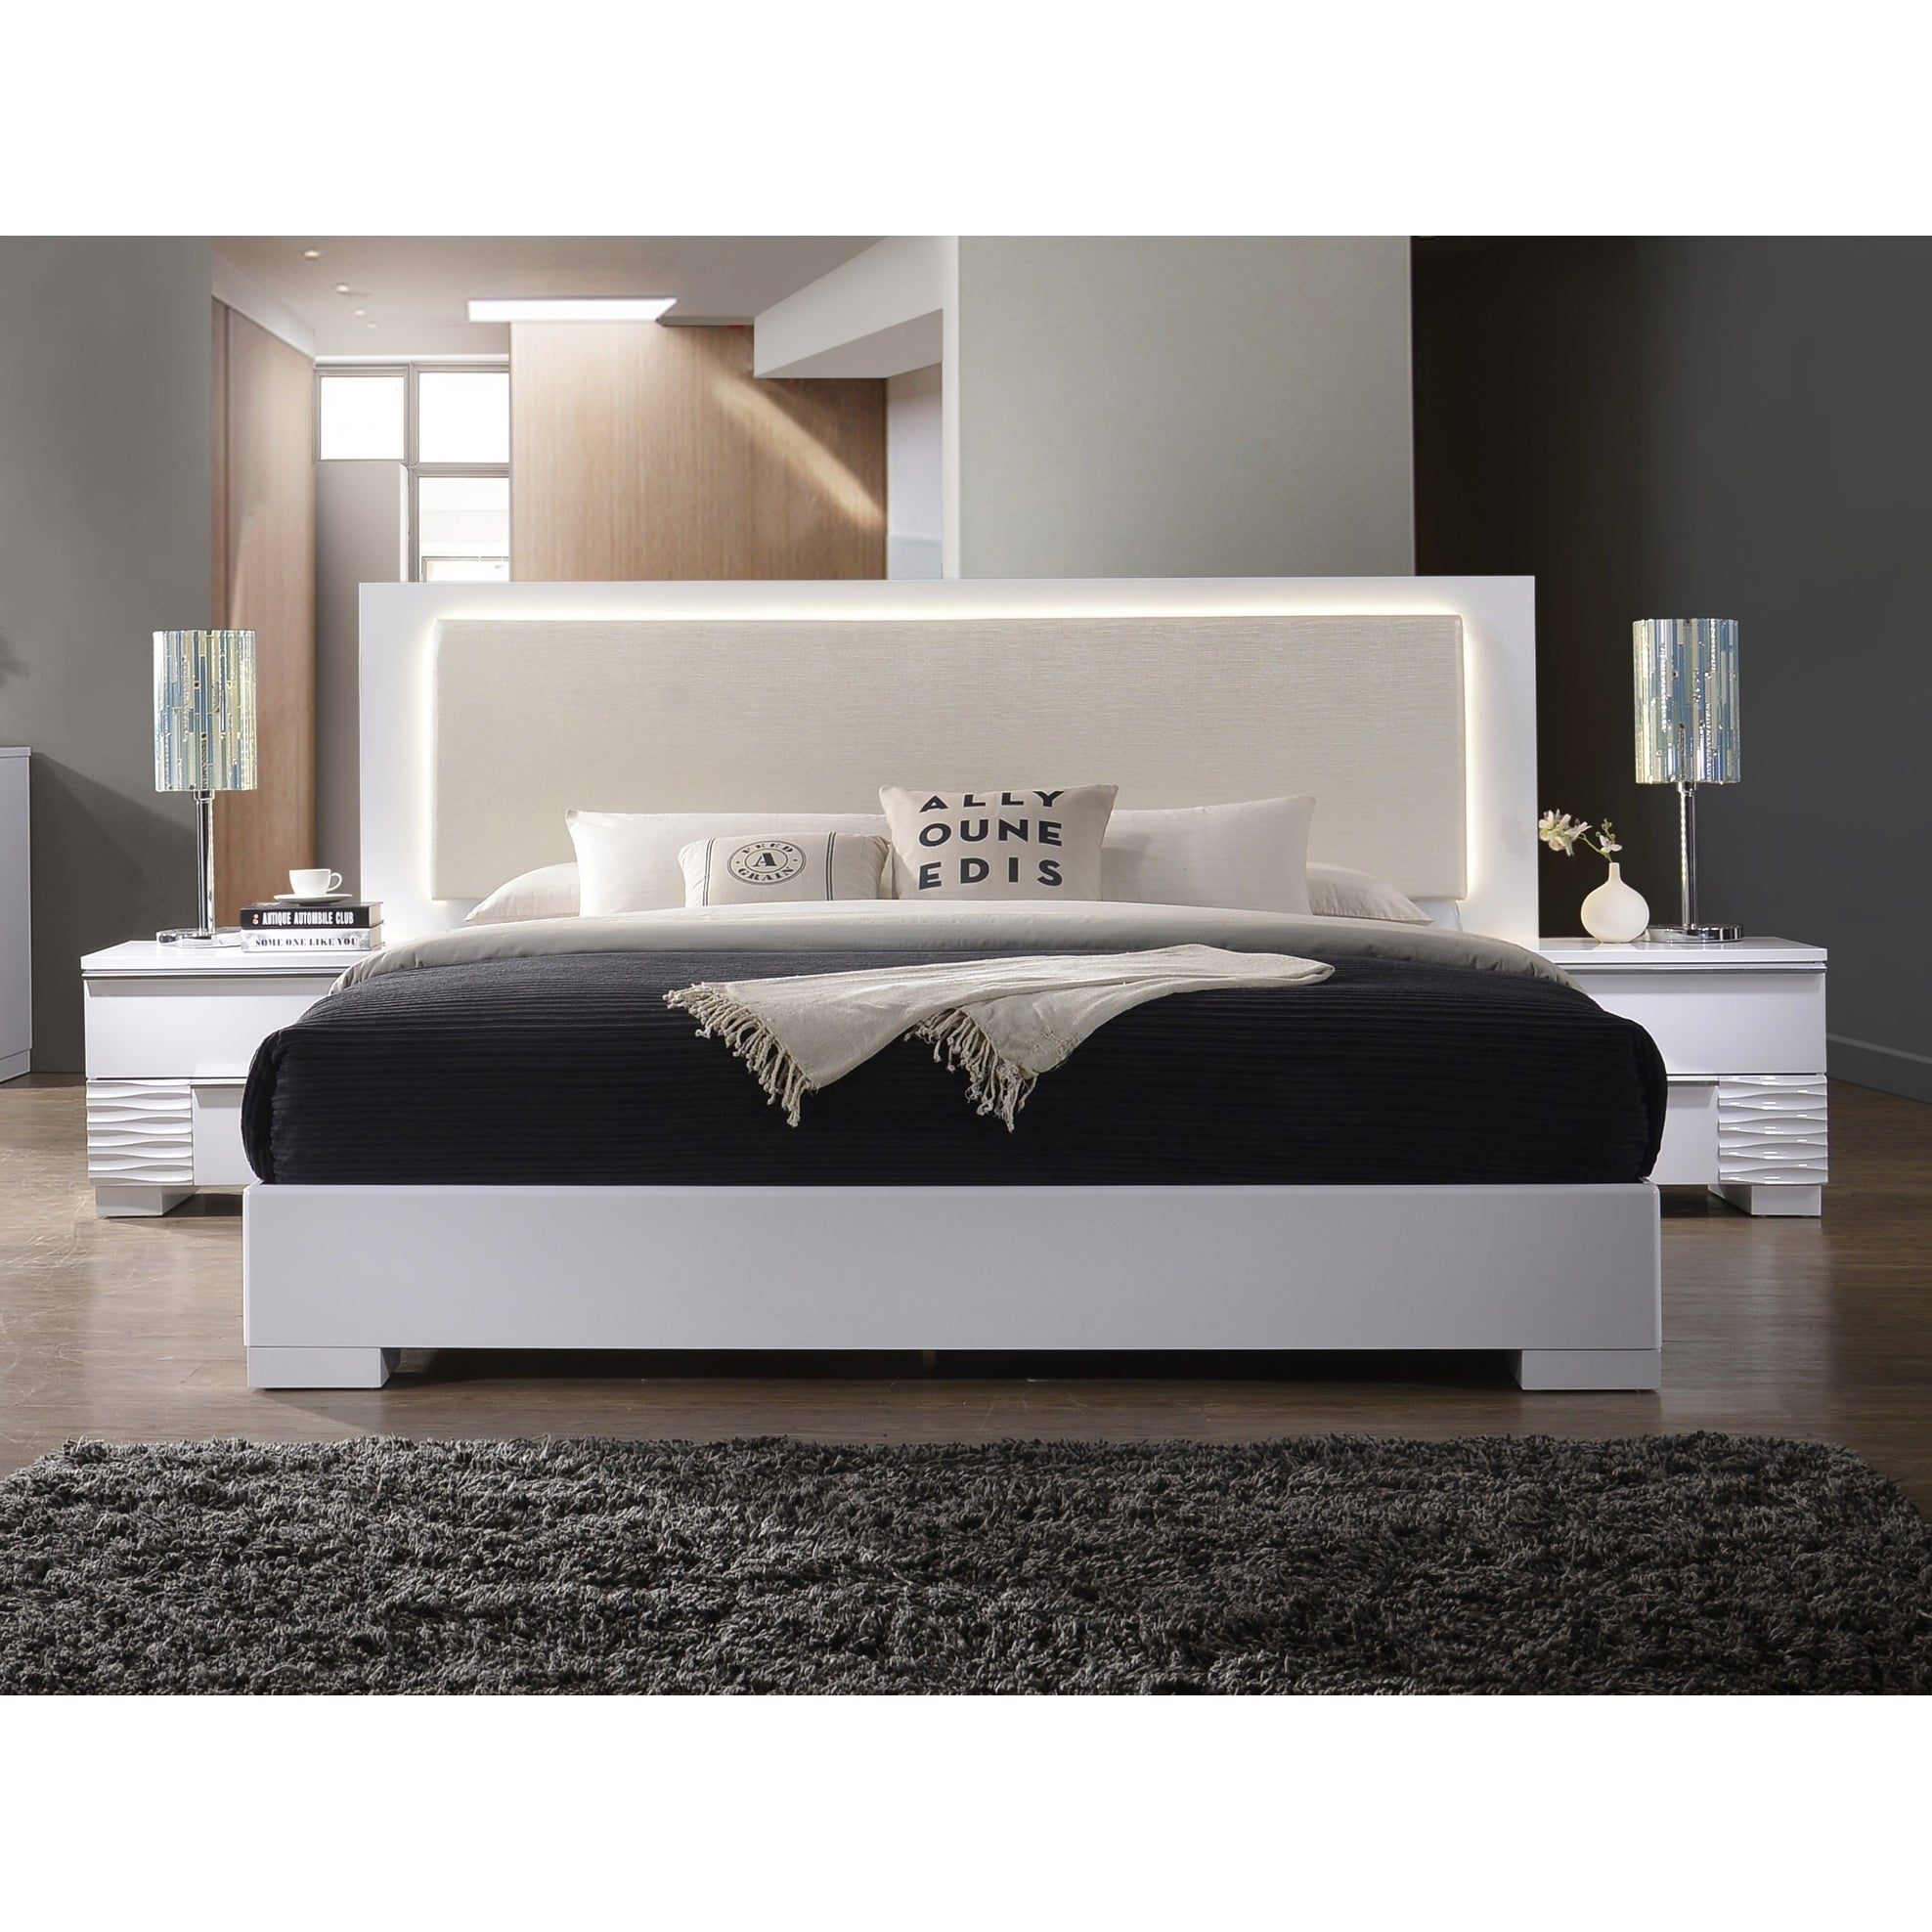 Best Master Furniture Athens White with LED Lighting Platform Bed ...